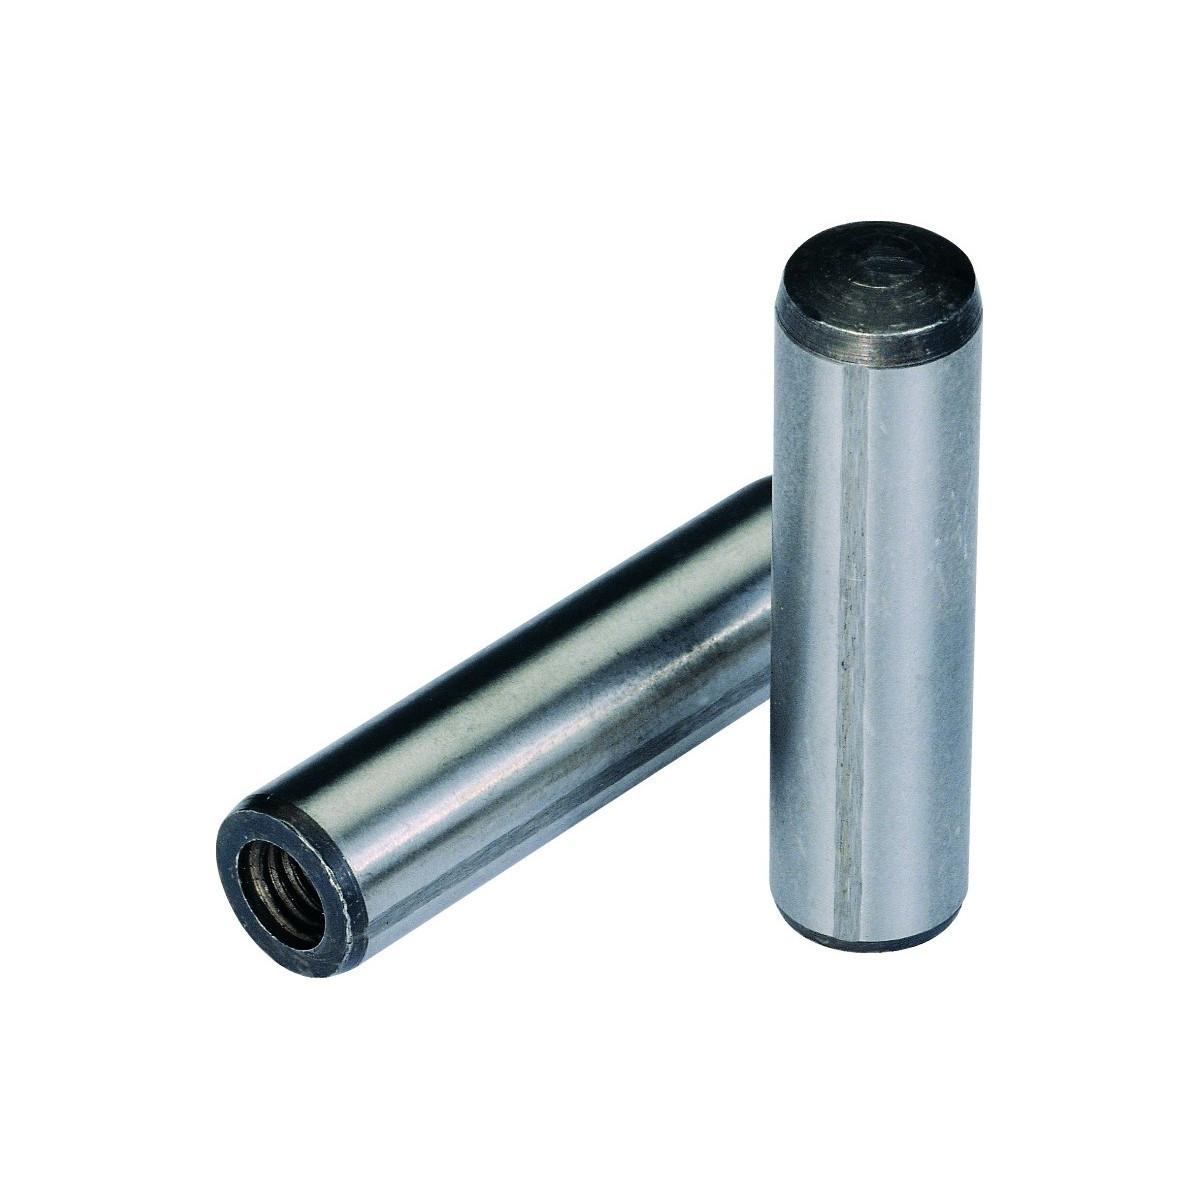 Штифт цилиндрический MMG  DIN 7979D M16 х 120 Класс 10.9 (Фосфат) 1 шт